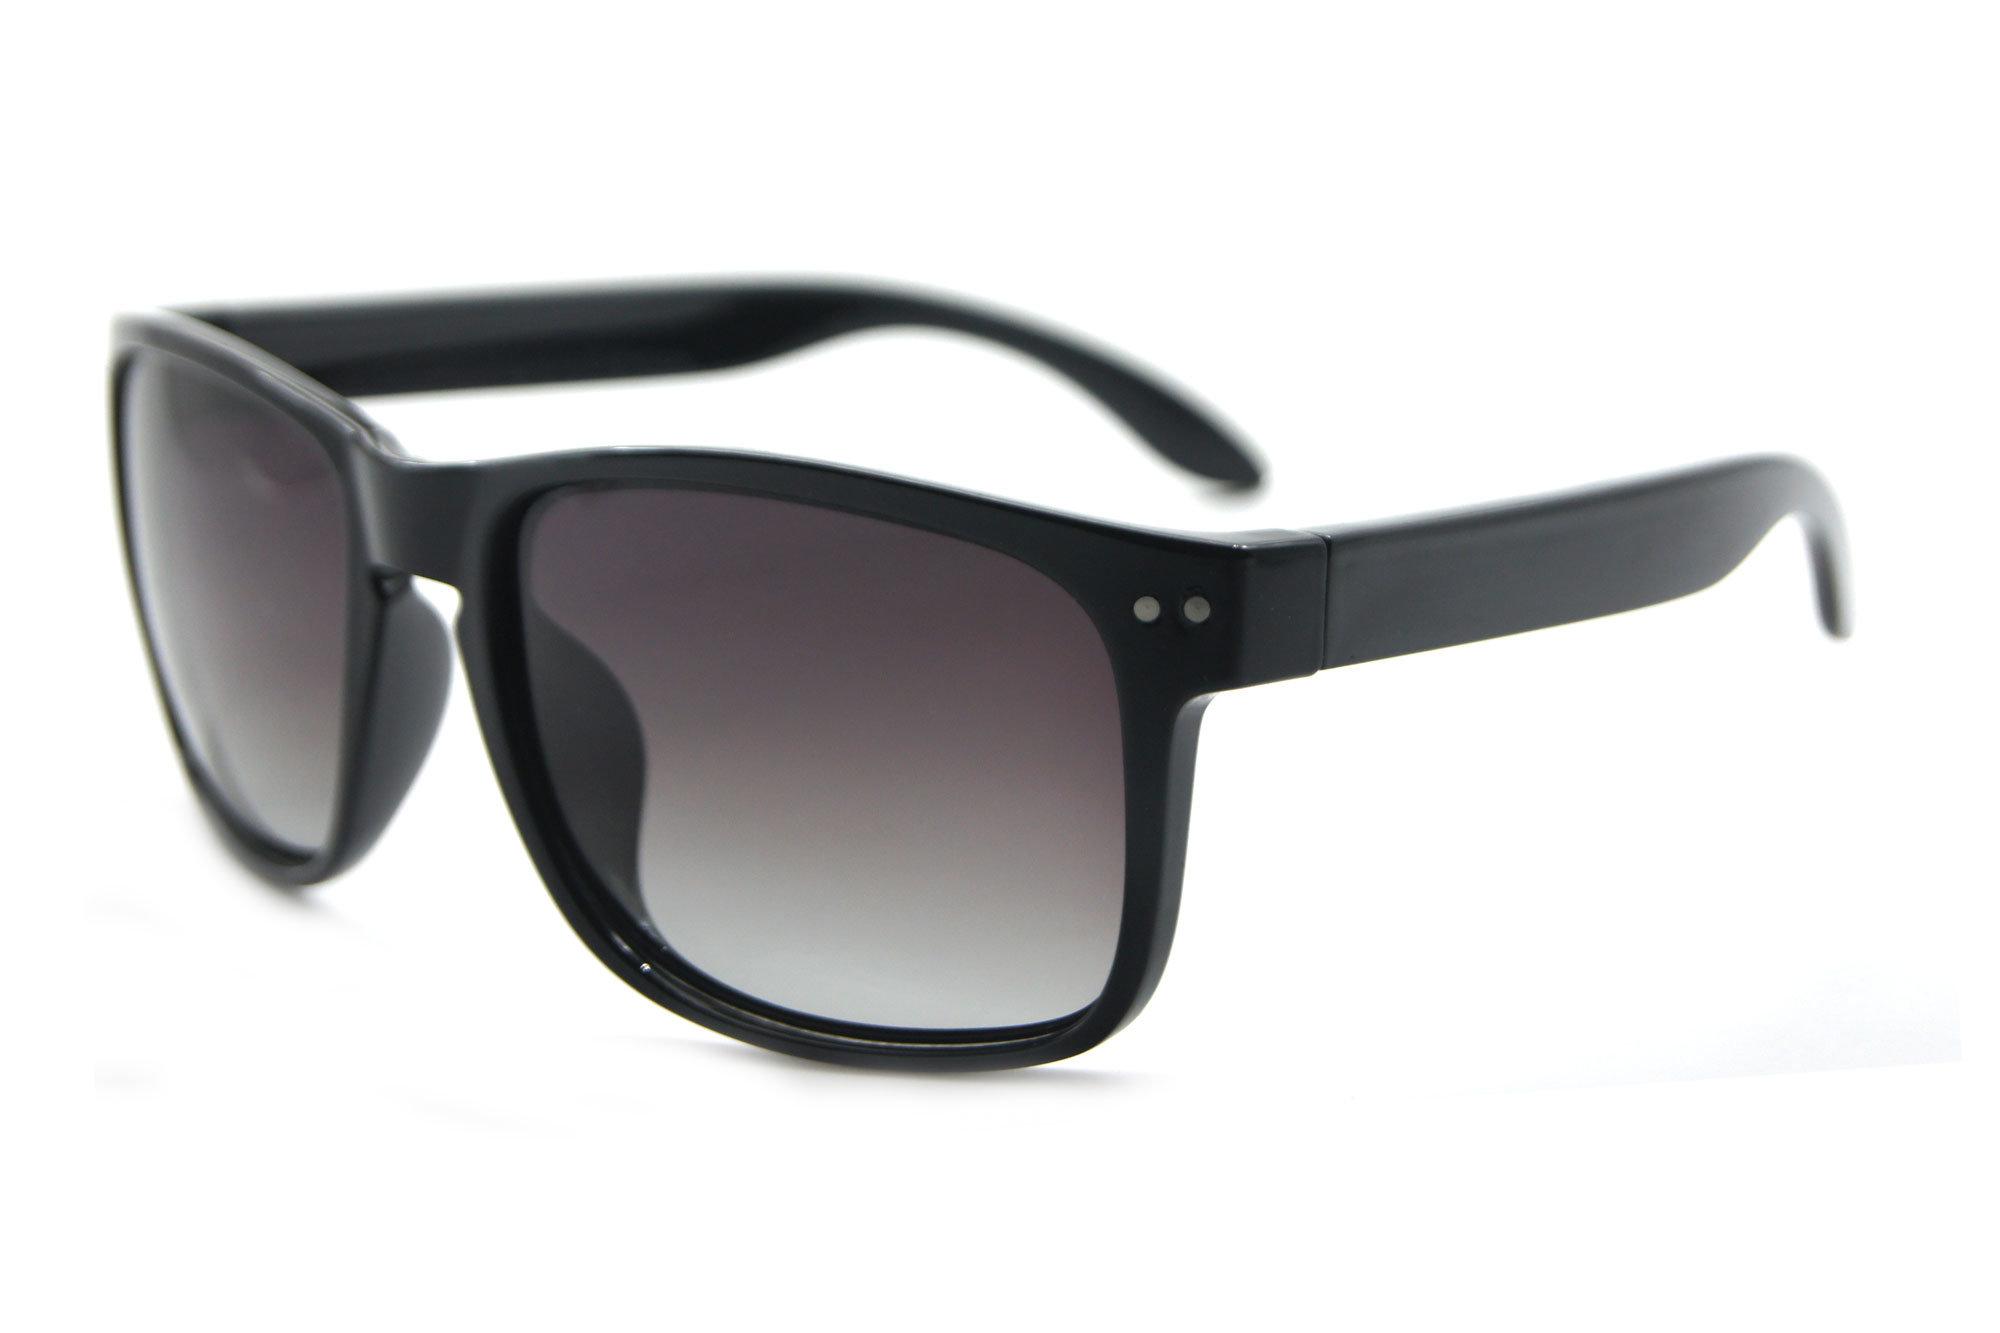 Latest Design Fashion High Quality UV 400 Protection Sunglasses